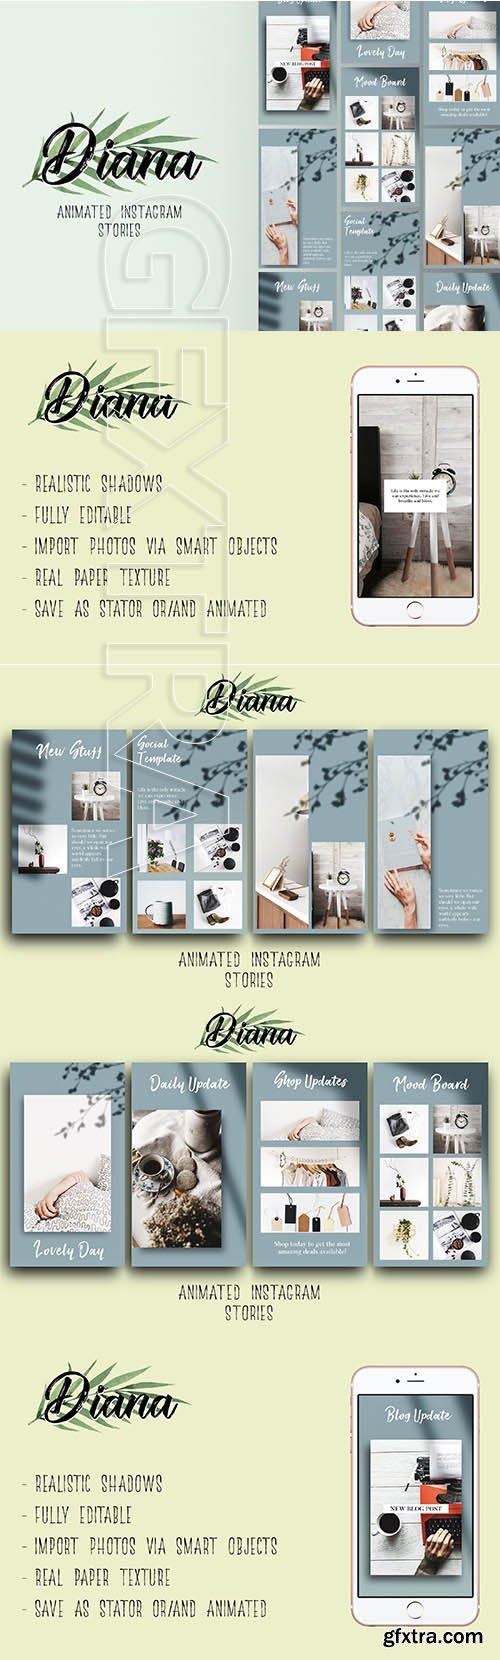 CreativeMarket - Diana Animated Instagram Stories 3275228